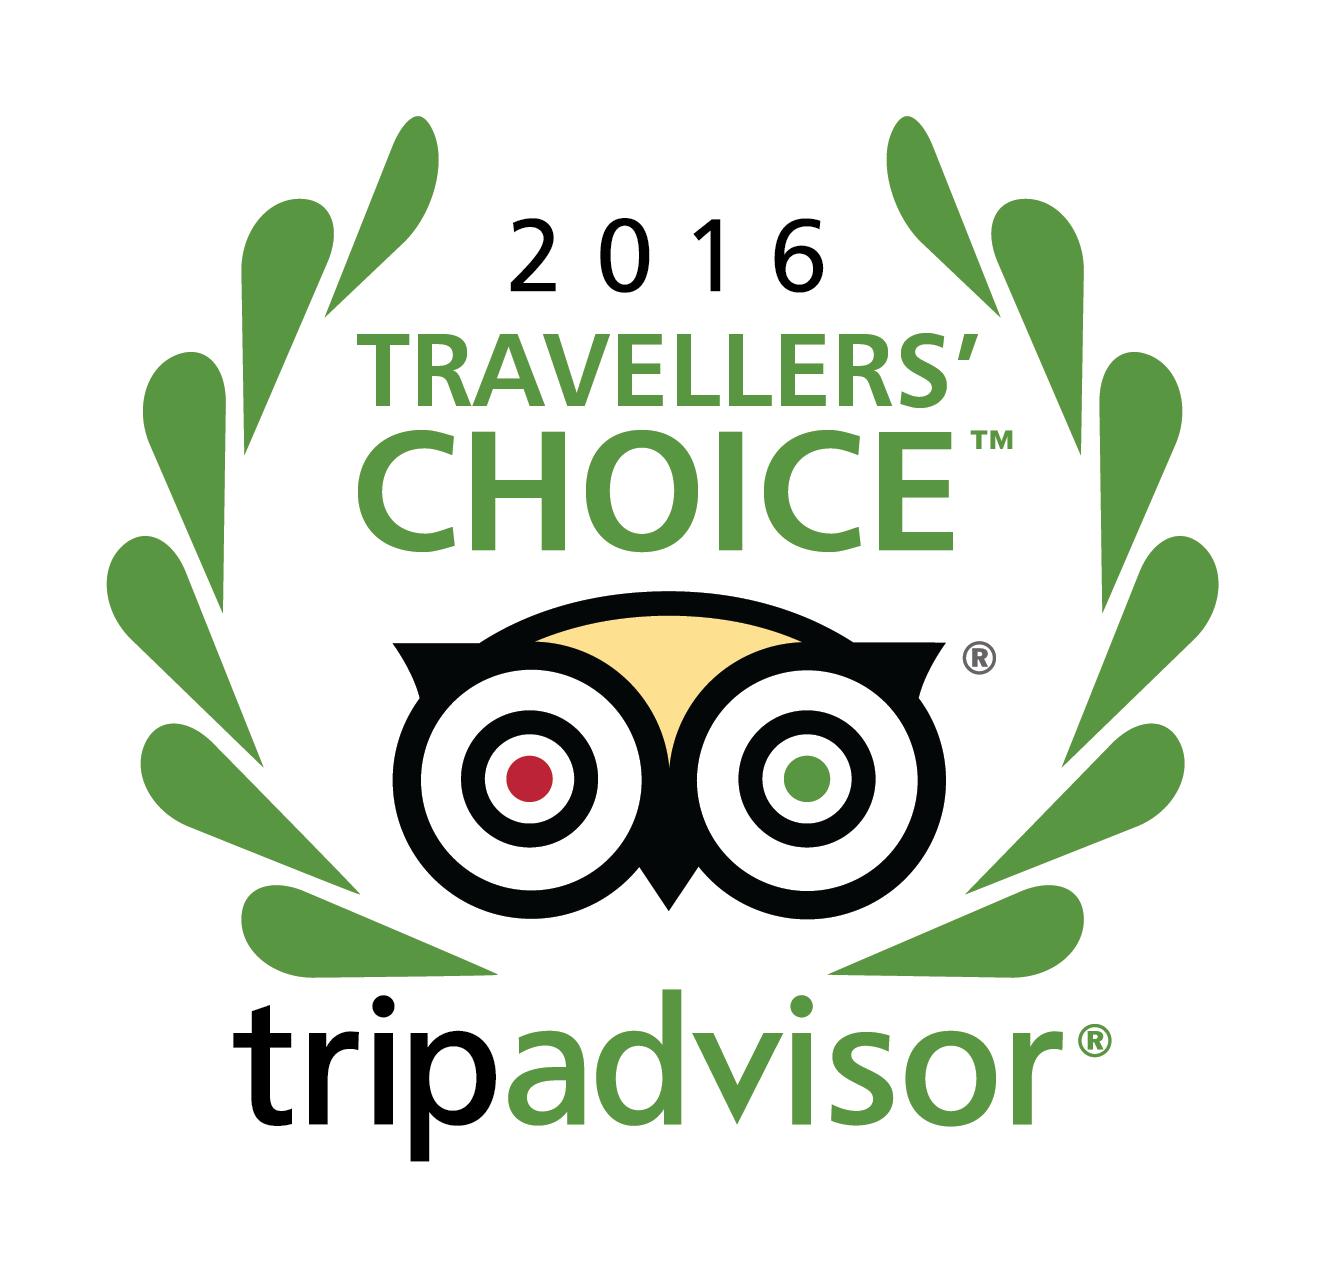 Hotel Villa Maija Hanko TripAdvisor 2016 Travellers' Choice Award Winner